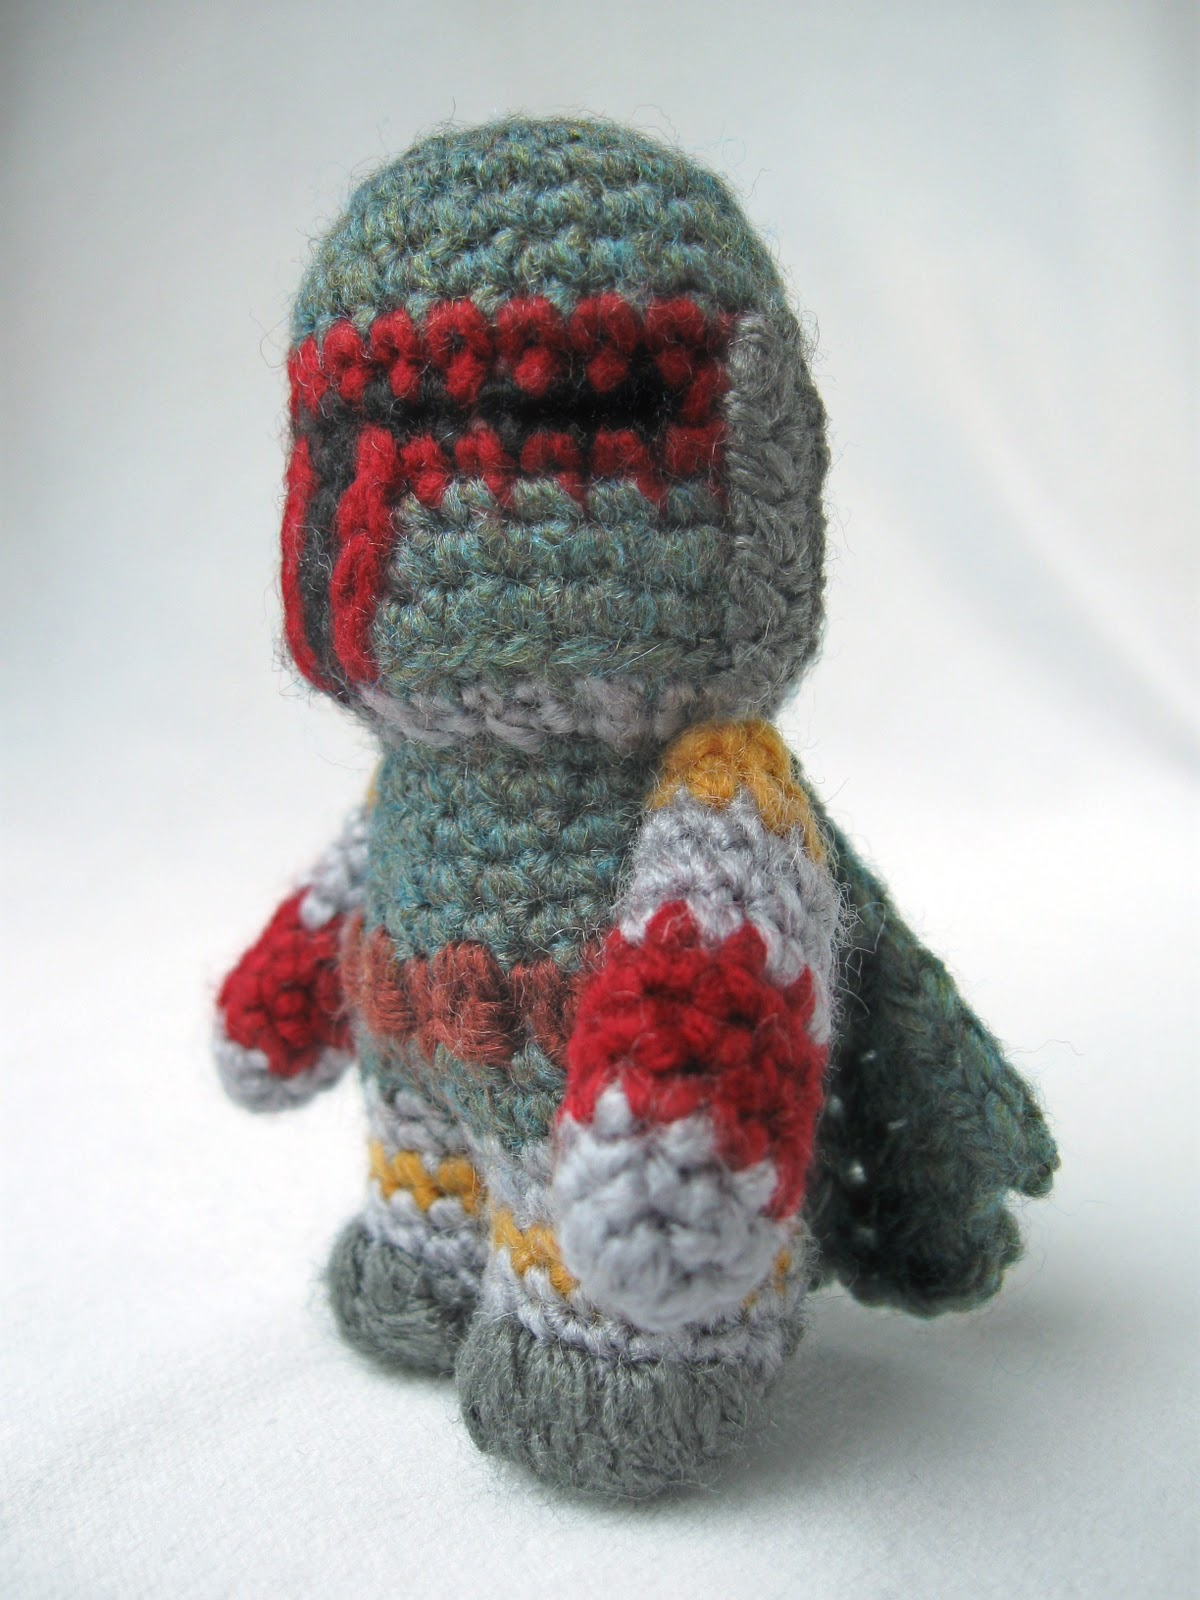 Amigurumi Free Pattern Dinosaur : LucyRavenscar - Crochet Creatures: Boba Fett - Mini Amigurumi